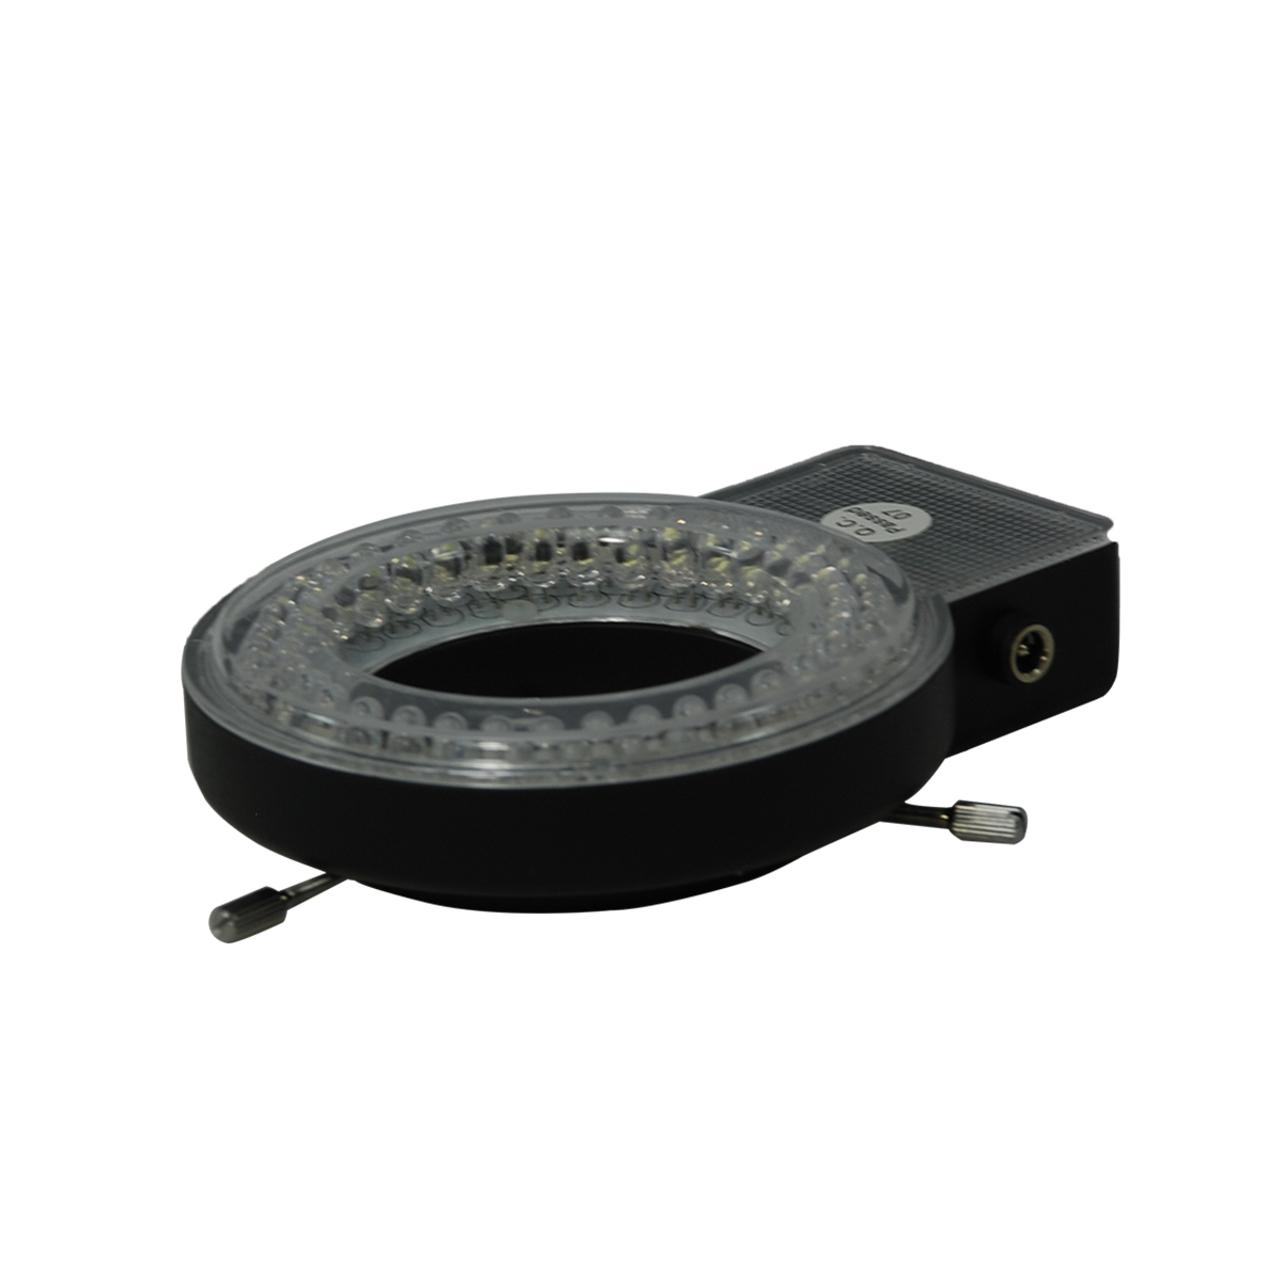 BoliOptics 72 LED Microscope Ring Light with Four-Zone Quadrant Control Diameter 61mm 6W ML19241131